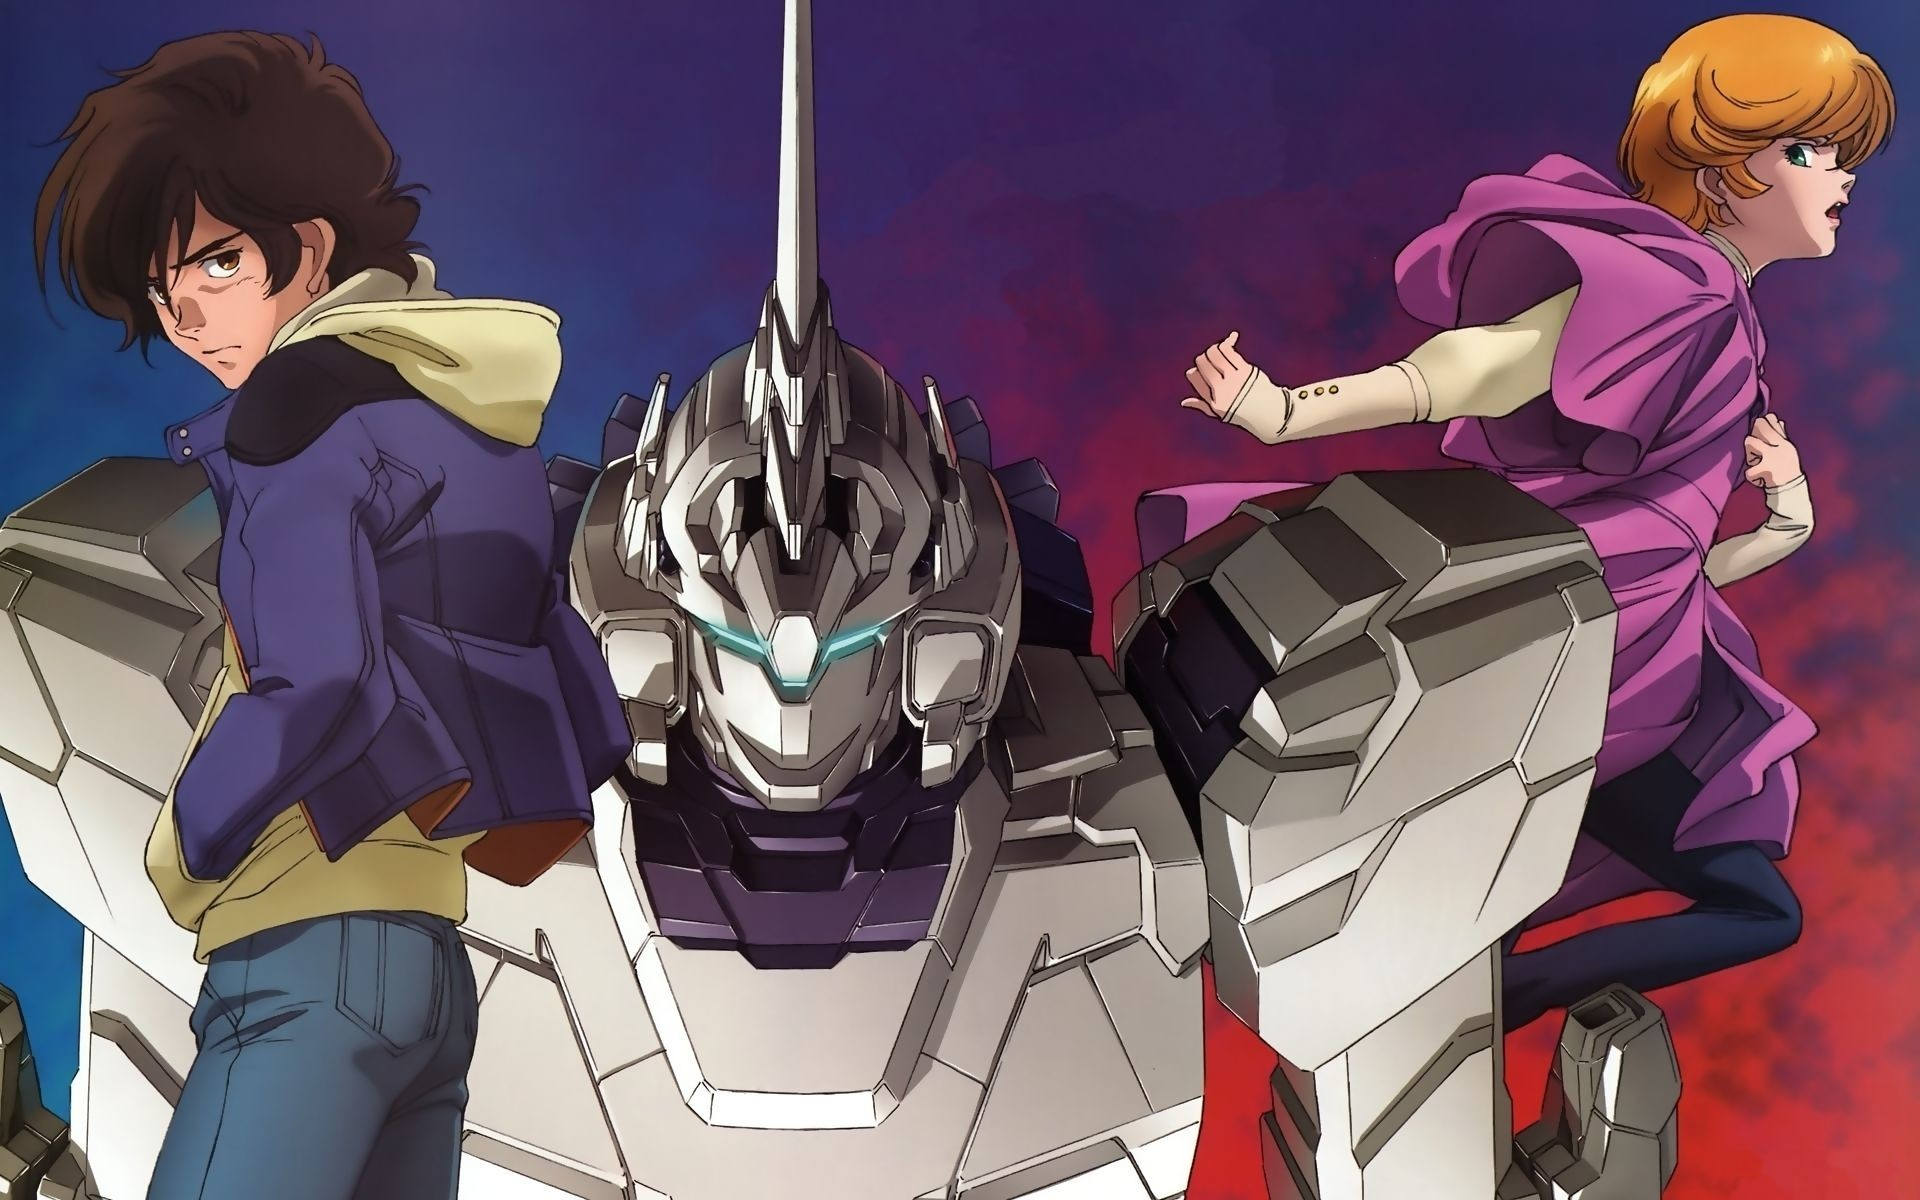 Mobile Suit Gundam · download Mobile Suit Gundam image